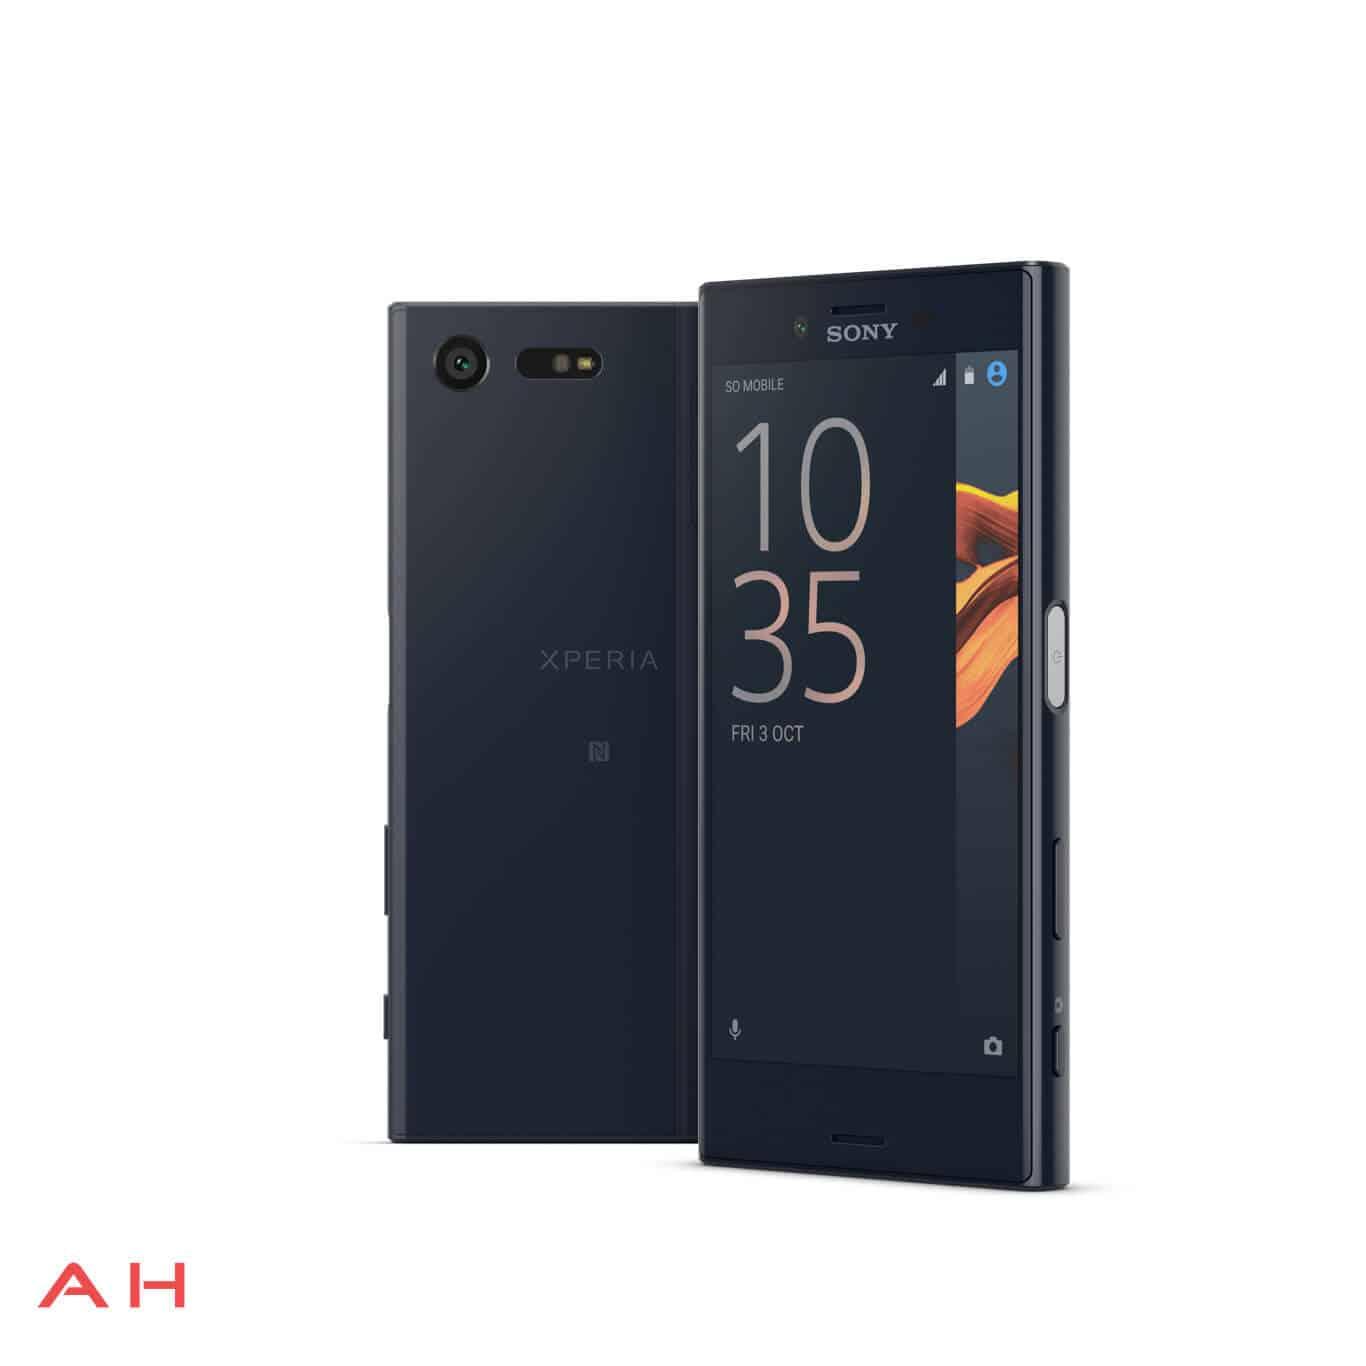 Sony Xperia X Compact AH 9